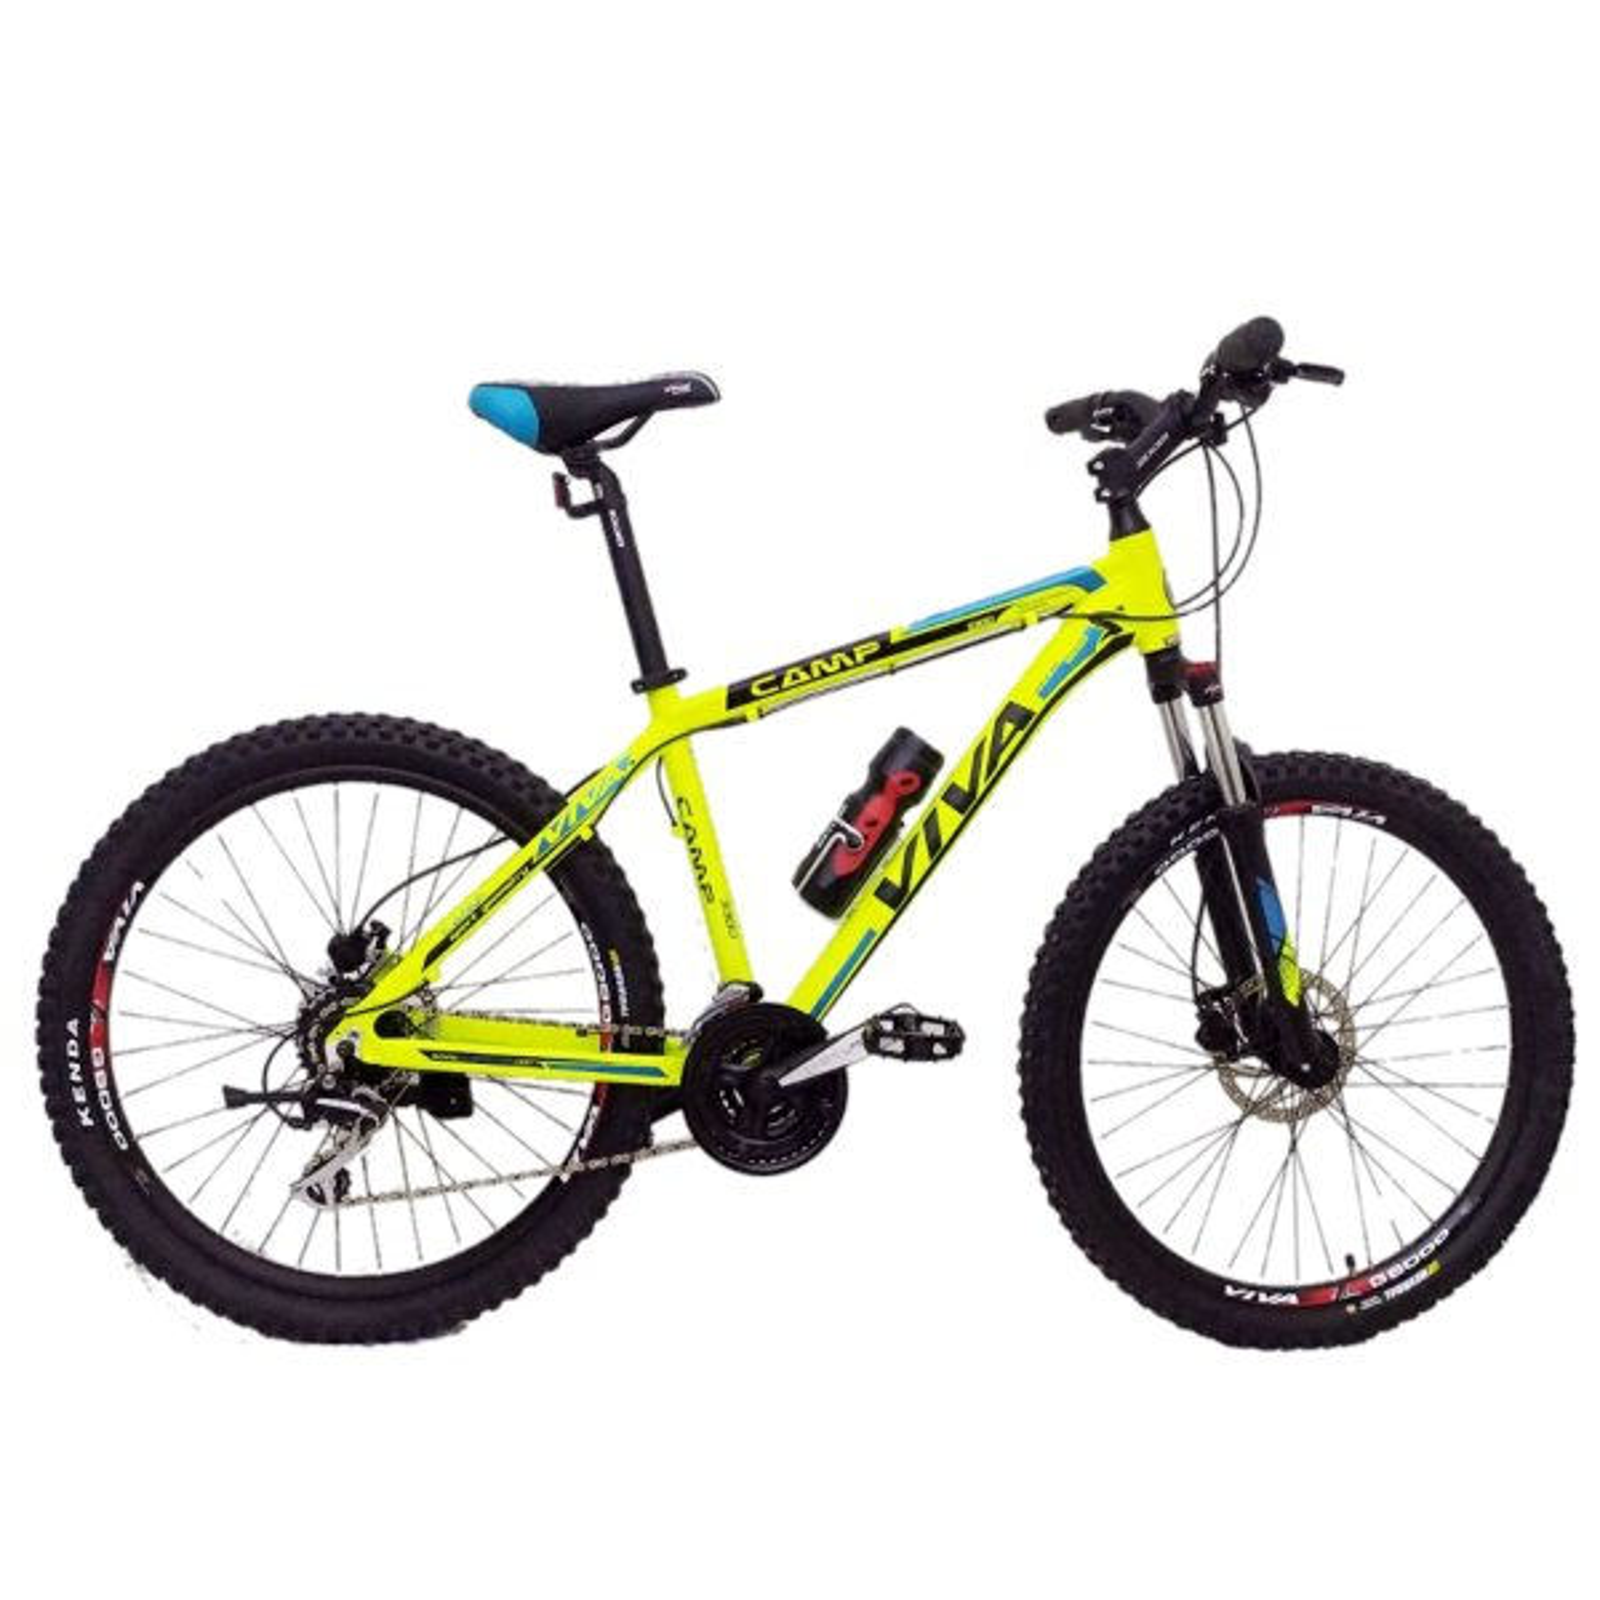 دوچرخه کوهستان ویوا مدل کمپ سایز 26